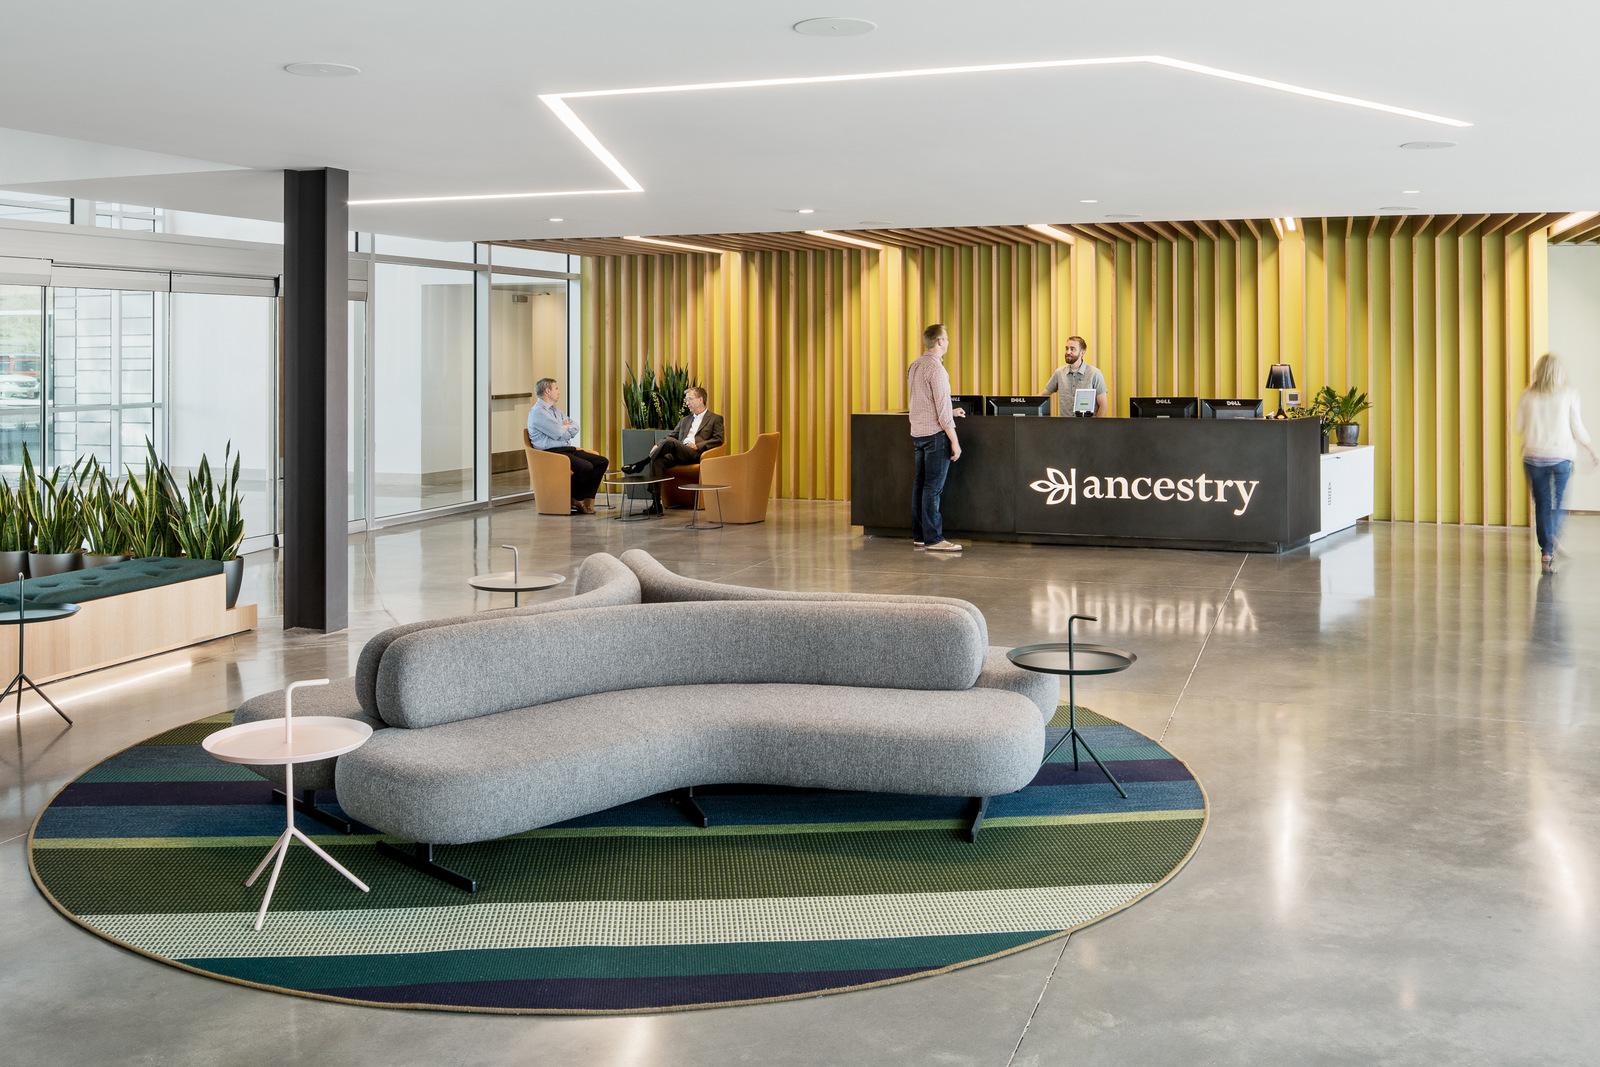 ancestrycom office by rapt studio office snapshots ancestrycom featured office snapshots